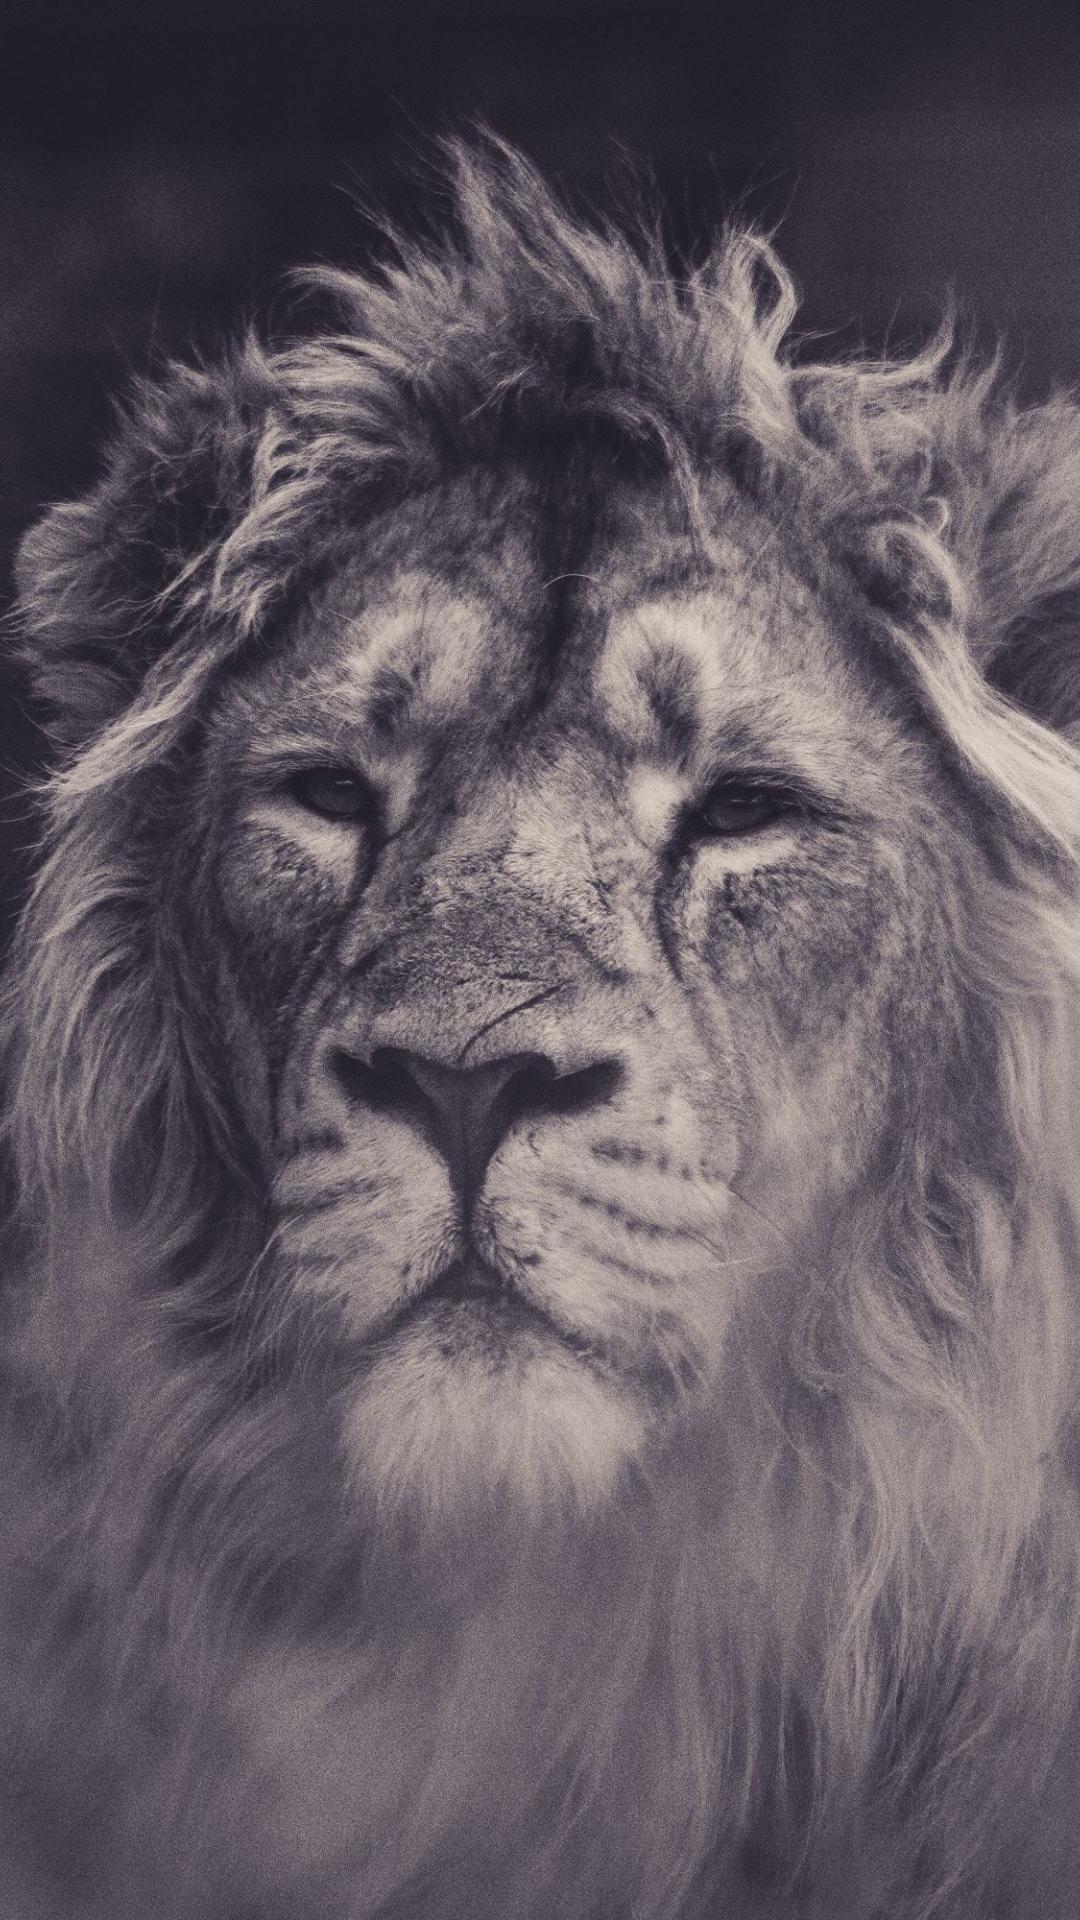 Lion, calm, predator, muzzle, 1080x1920 wallpaper